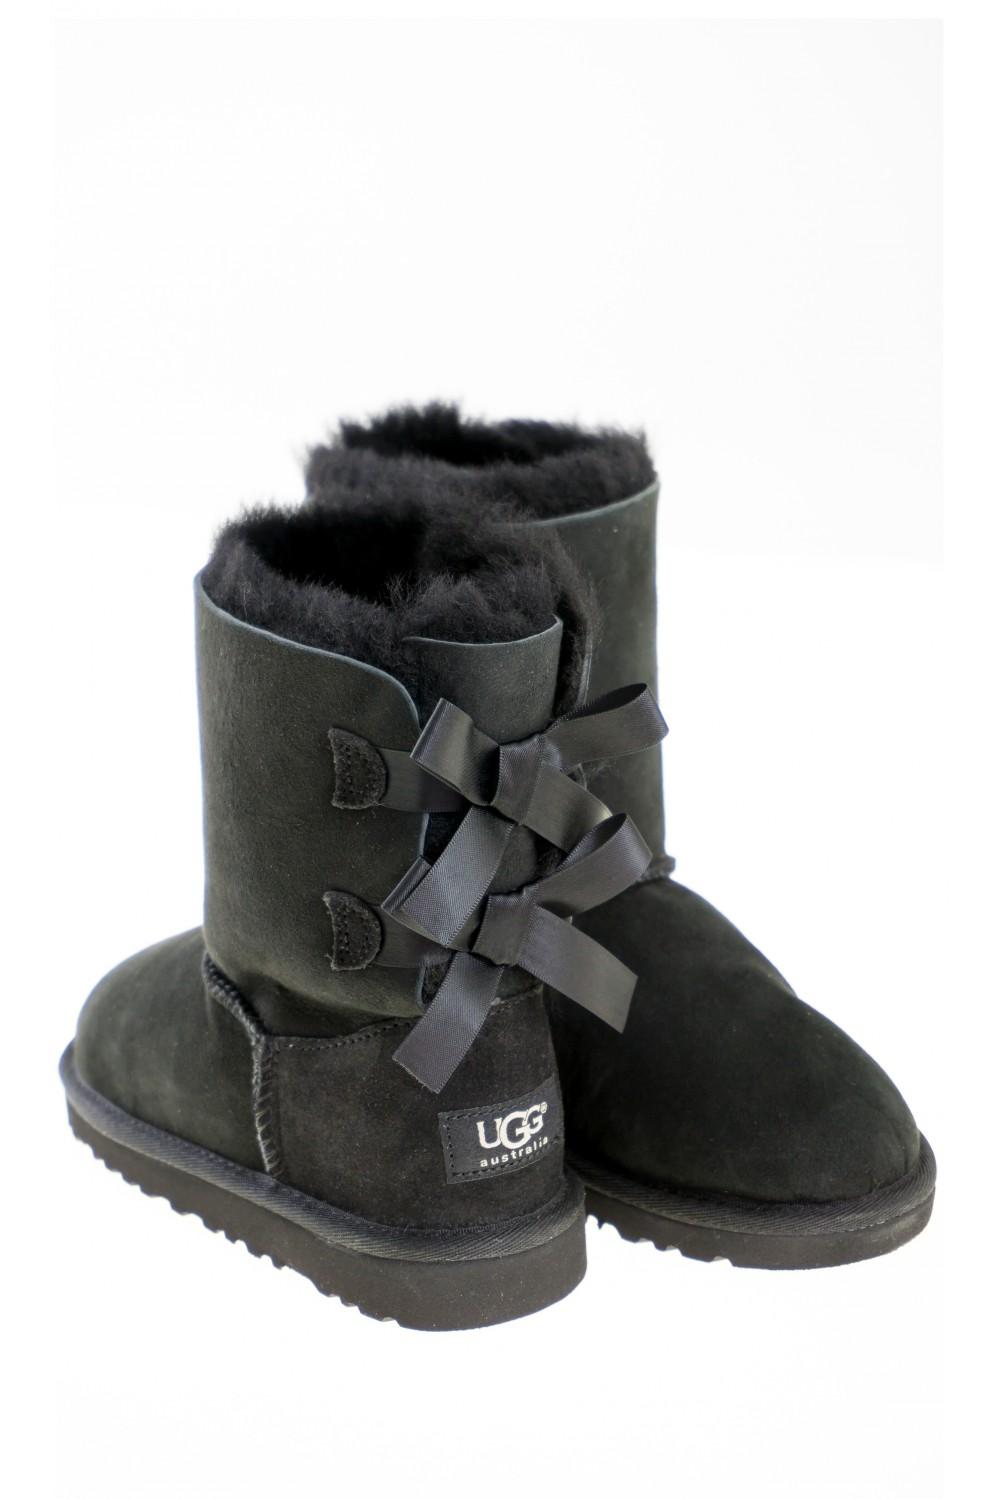 ugg boots shoe box